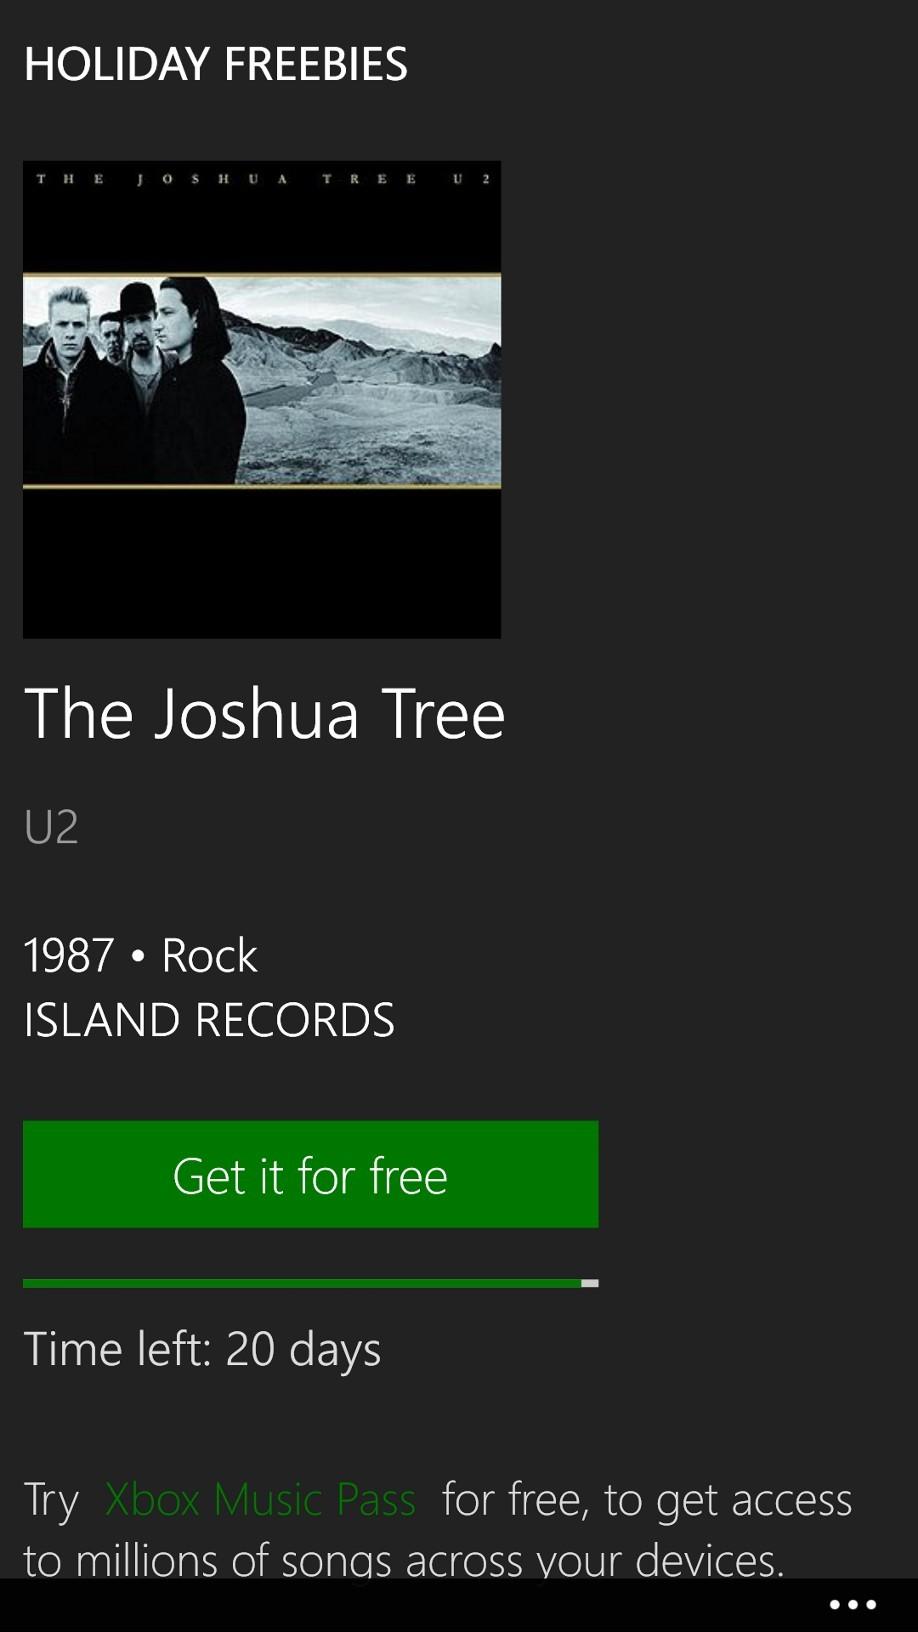 Microsoft Gives Away 100 Music Albums to Windows Phone ... | 918 x 1632 jpeg 108kB